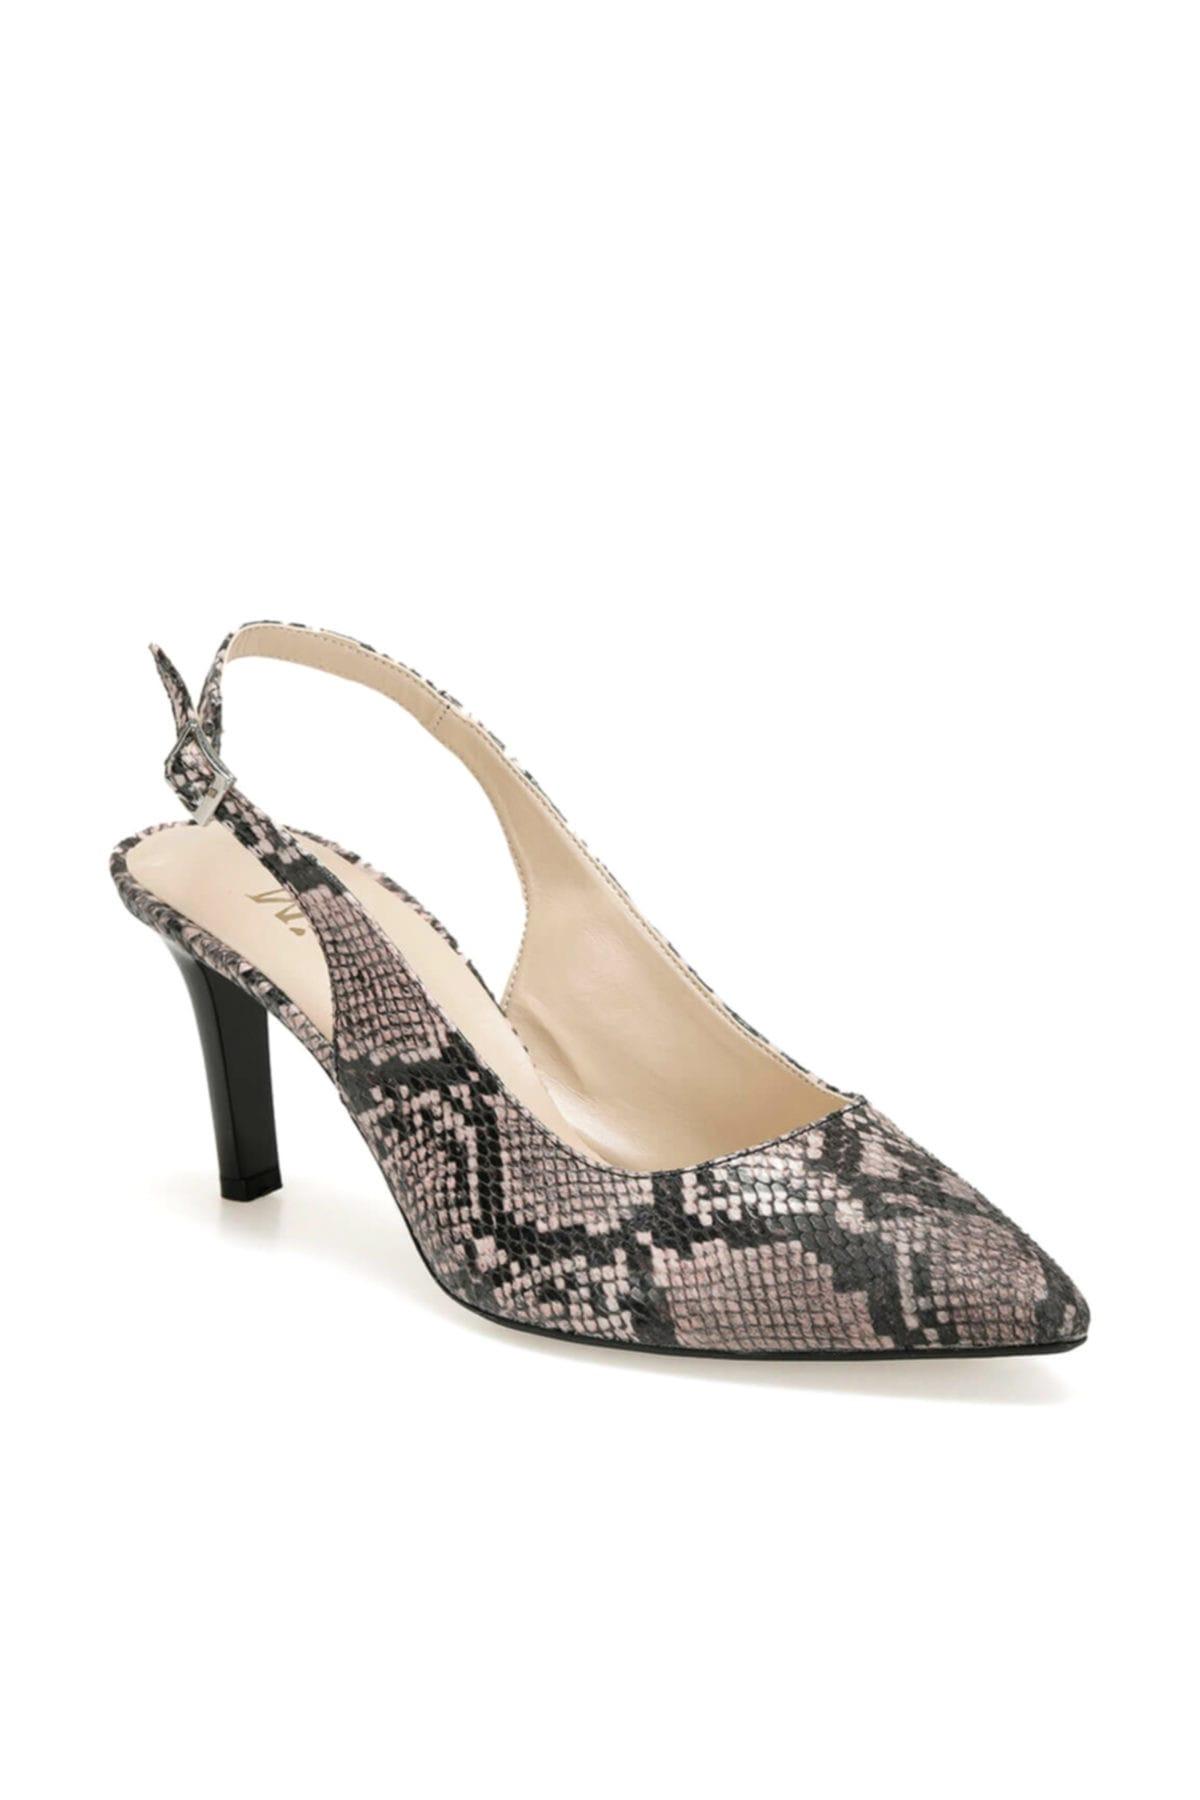 Miss F Ds19150 Yılan Rengi Pudra Kadın Ayakkabı 100443292 1